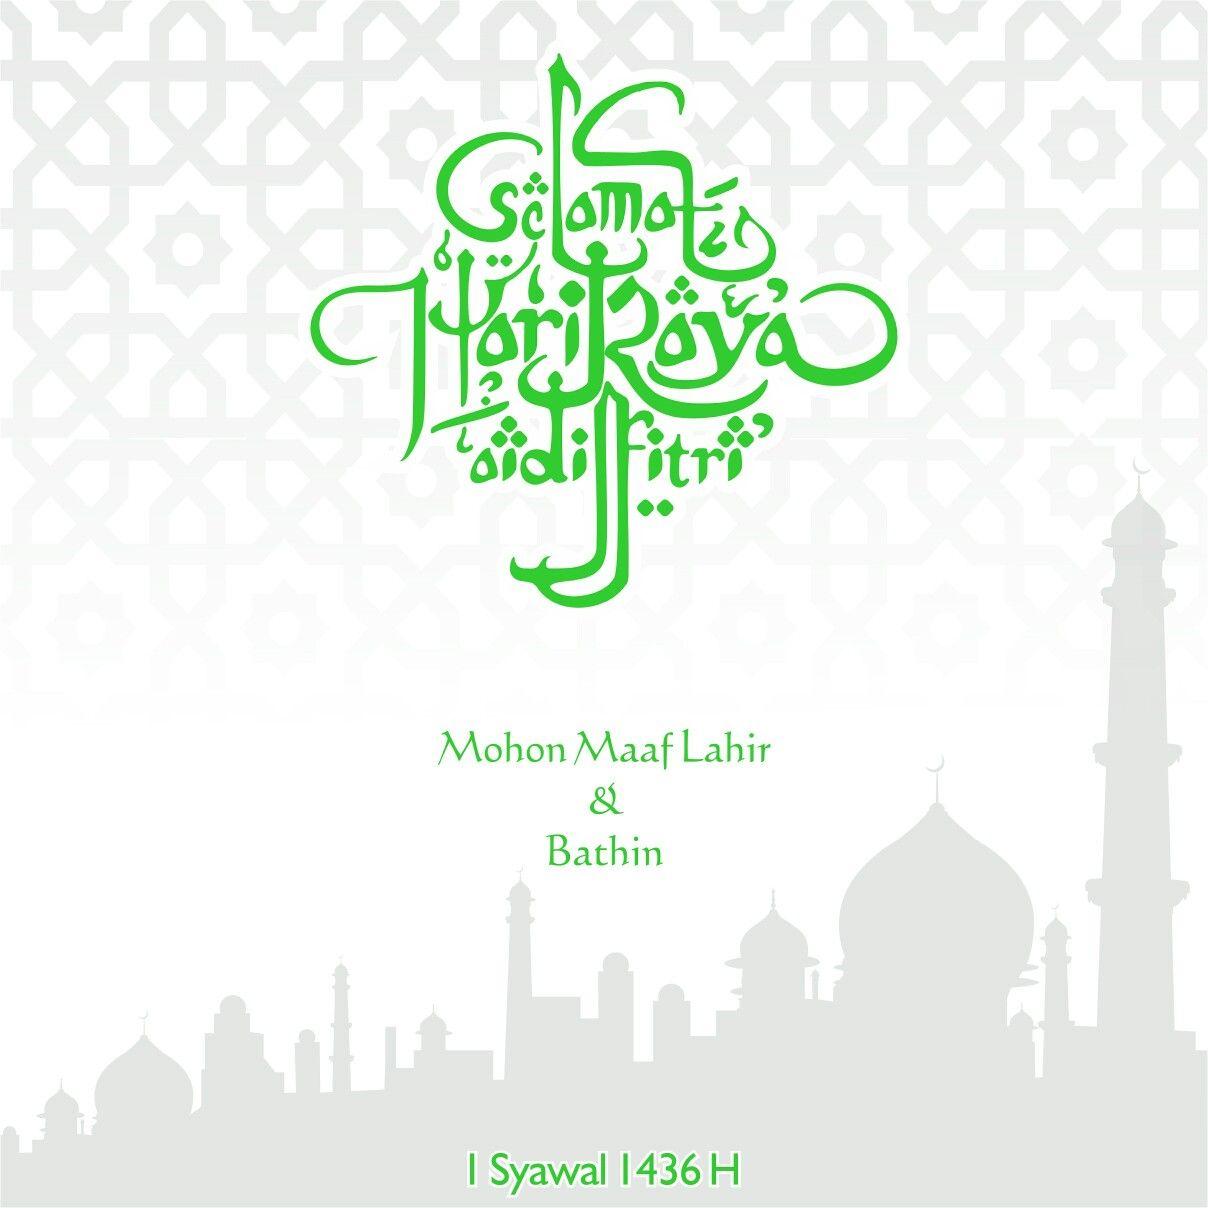 Happy Ied Mubarak Poster Happy Ied Al Fitr Poster Selamat Hari